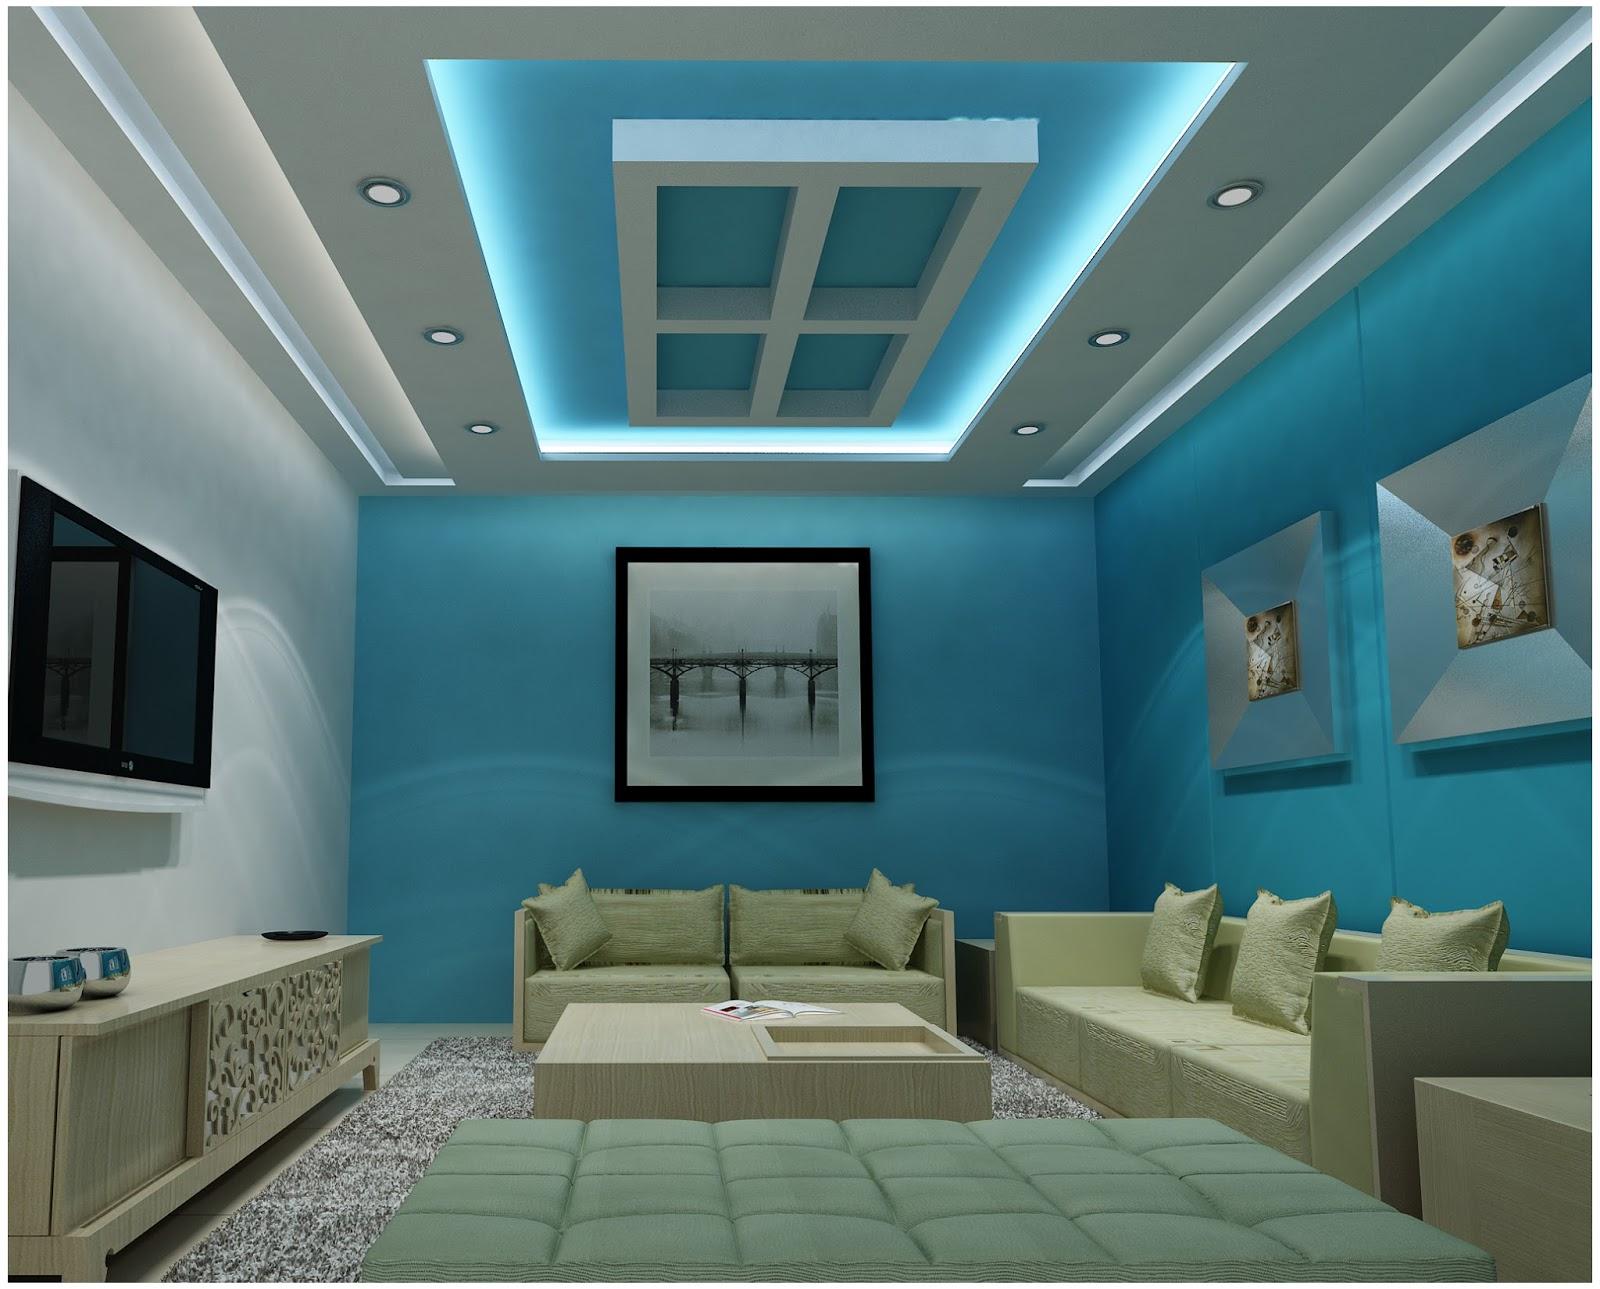 Plaster Ceiling Luxtury | Joy Studio Design Gallery - Best ...